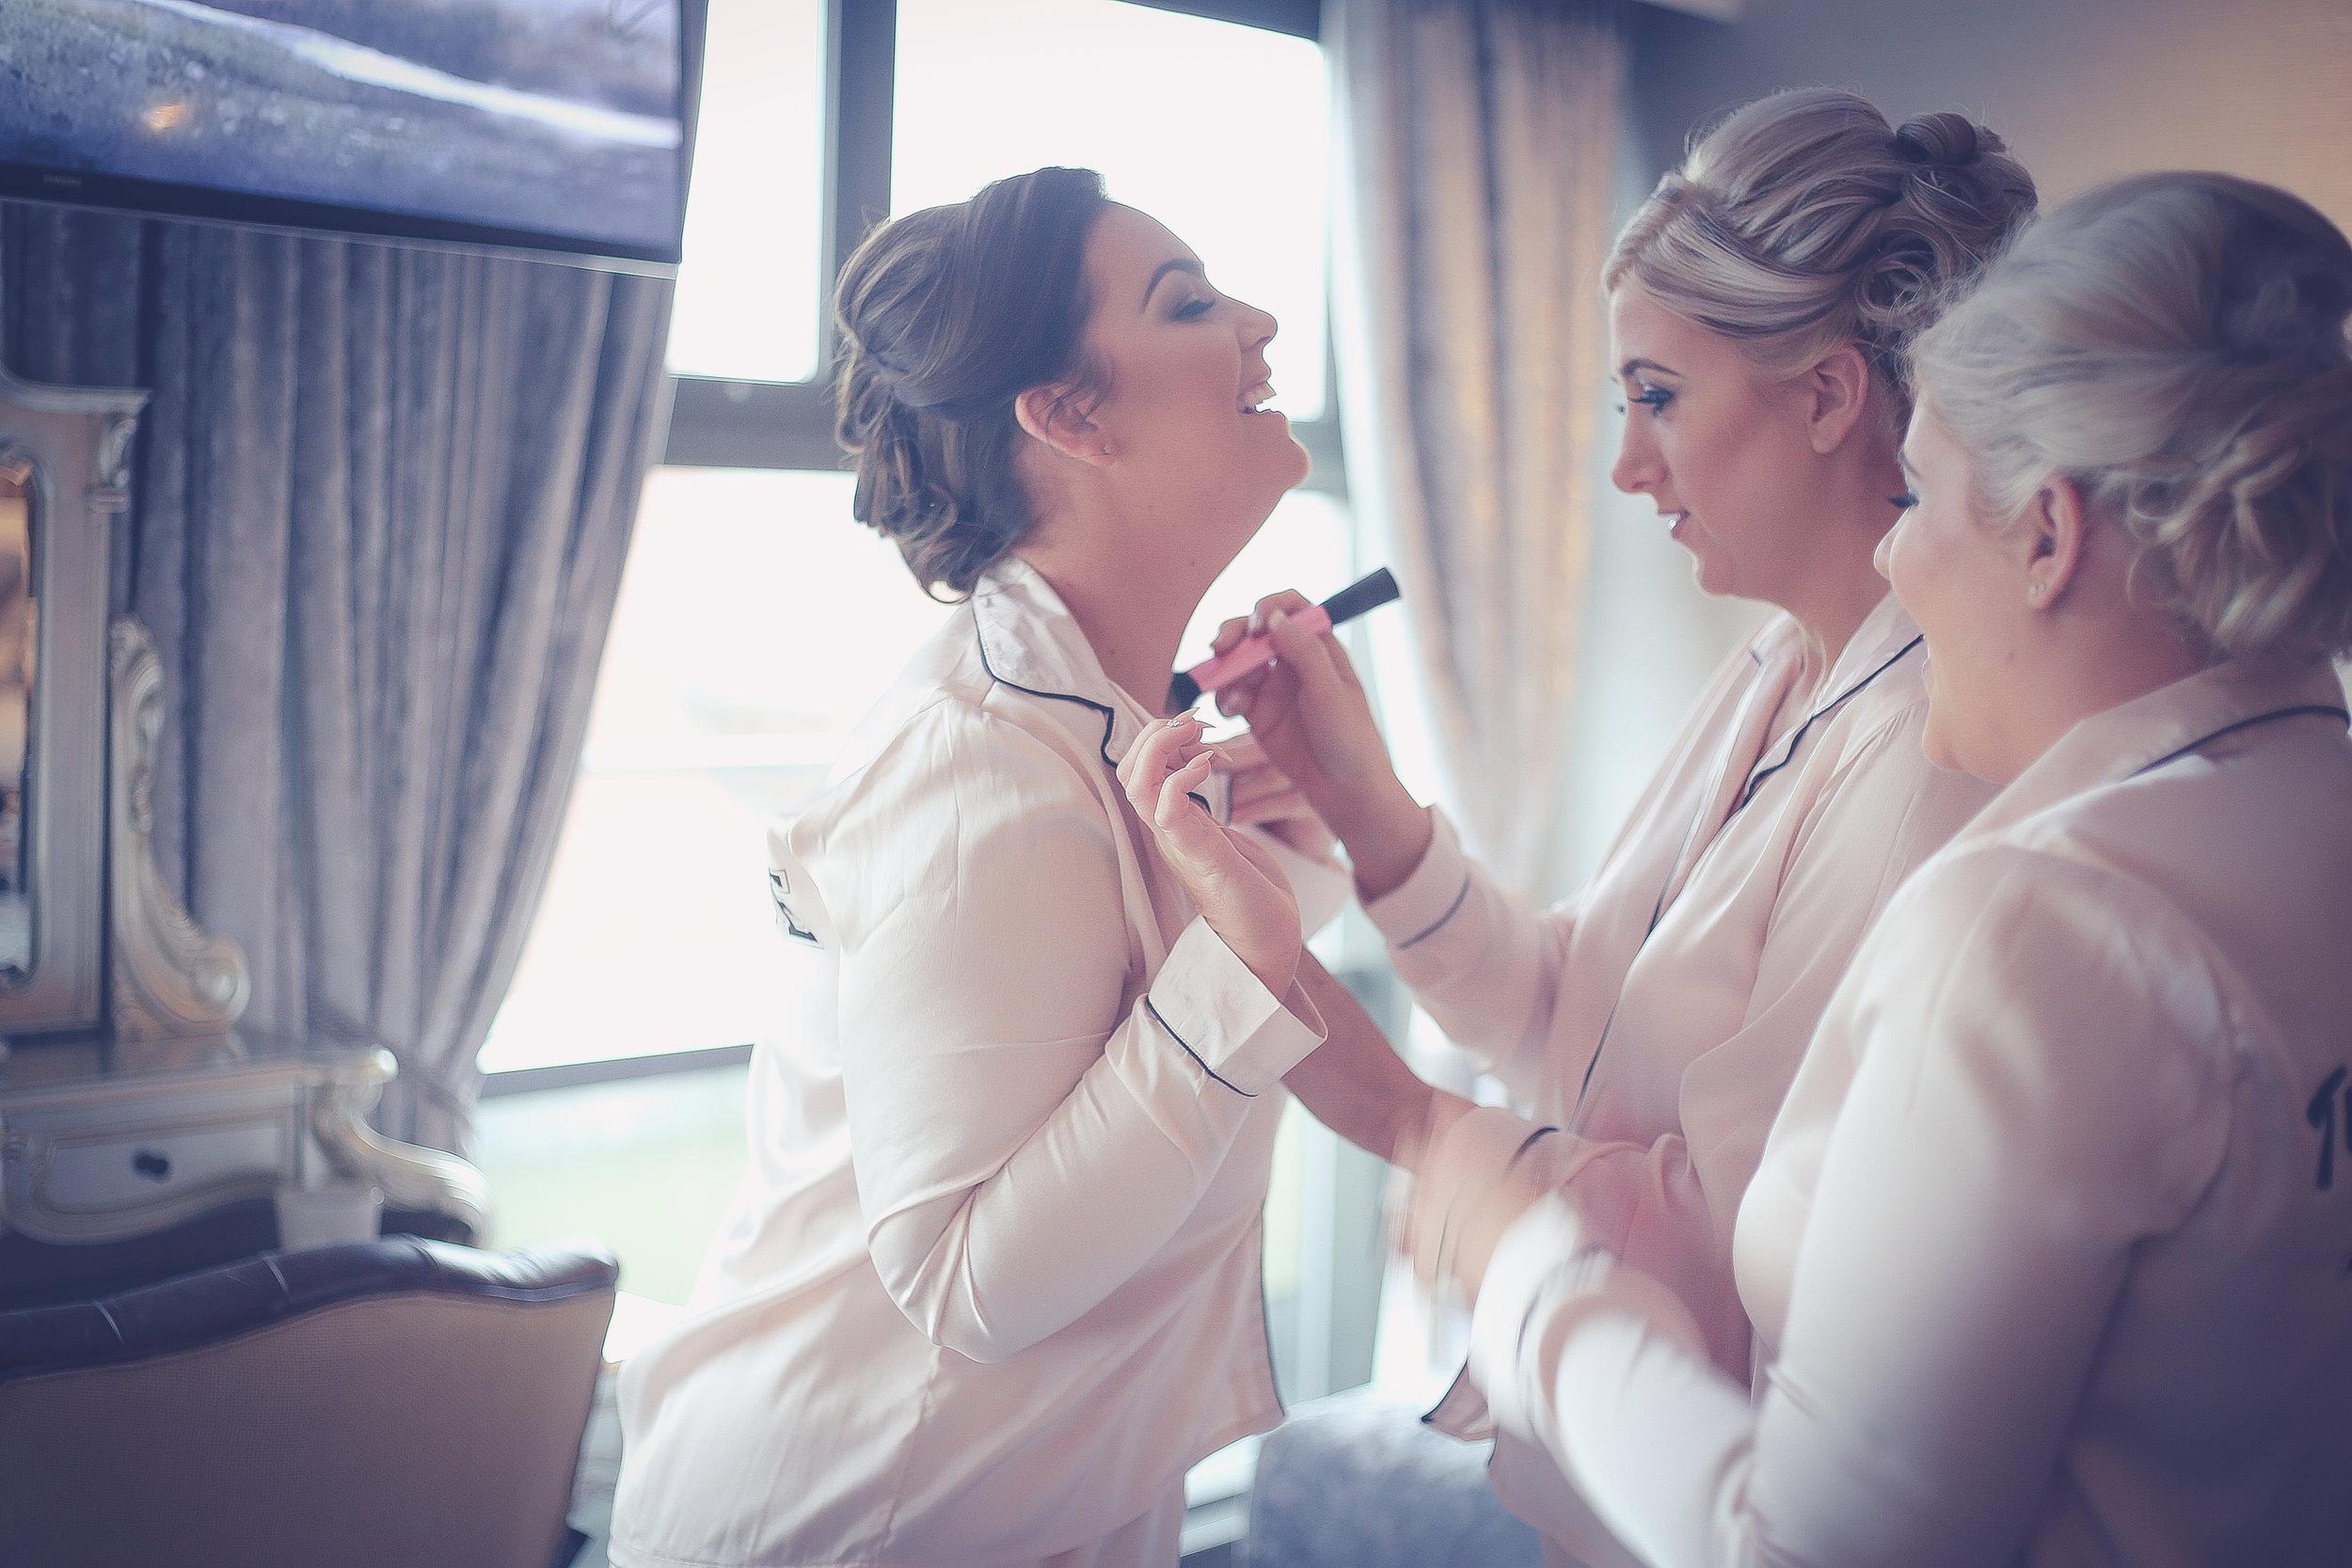 Weddings at the shankley hotel liverpool-1-13.jpg